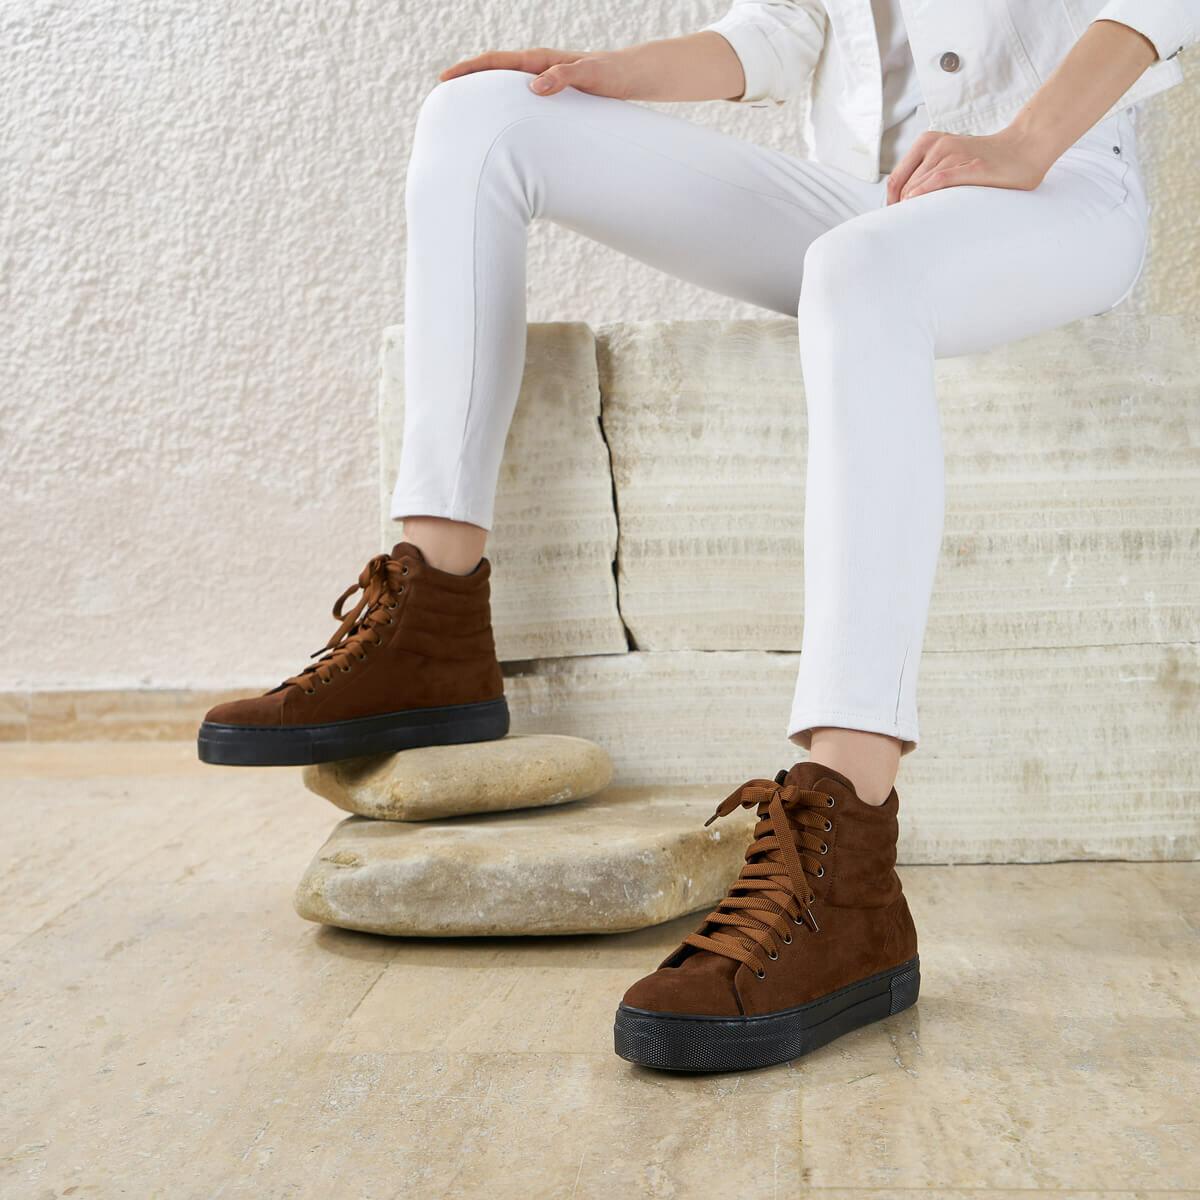 FLO HANDEL K17Z SUEDE Tan Women 'S Boots BUTIGO